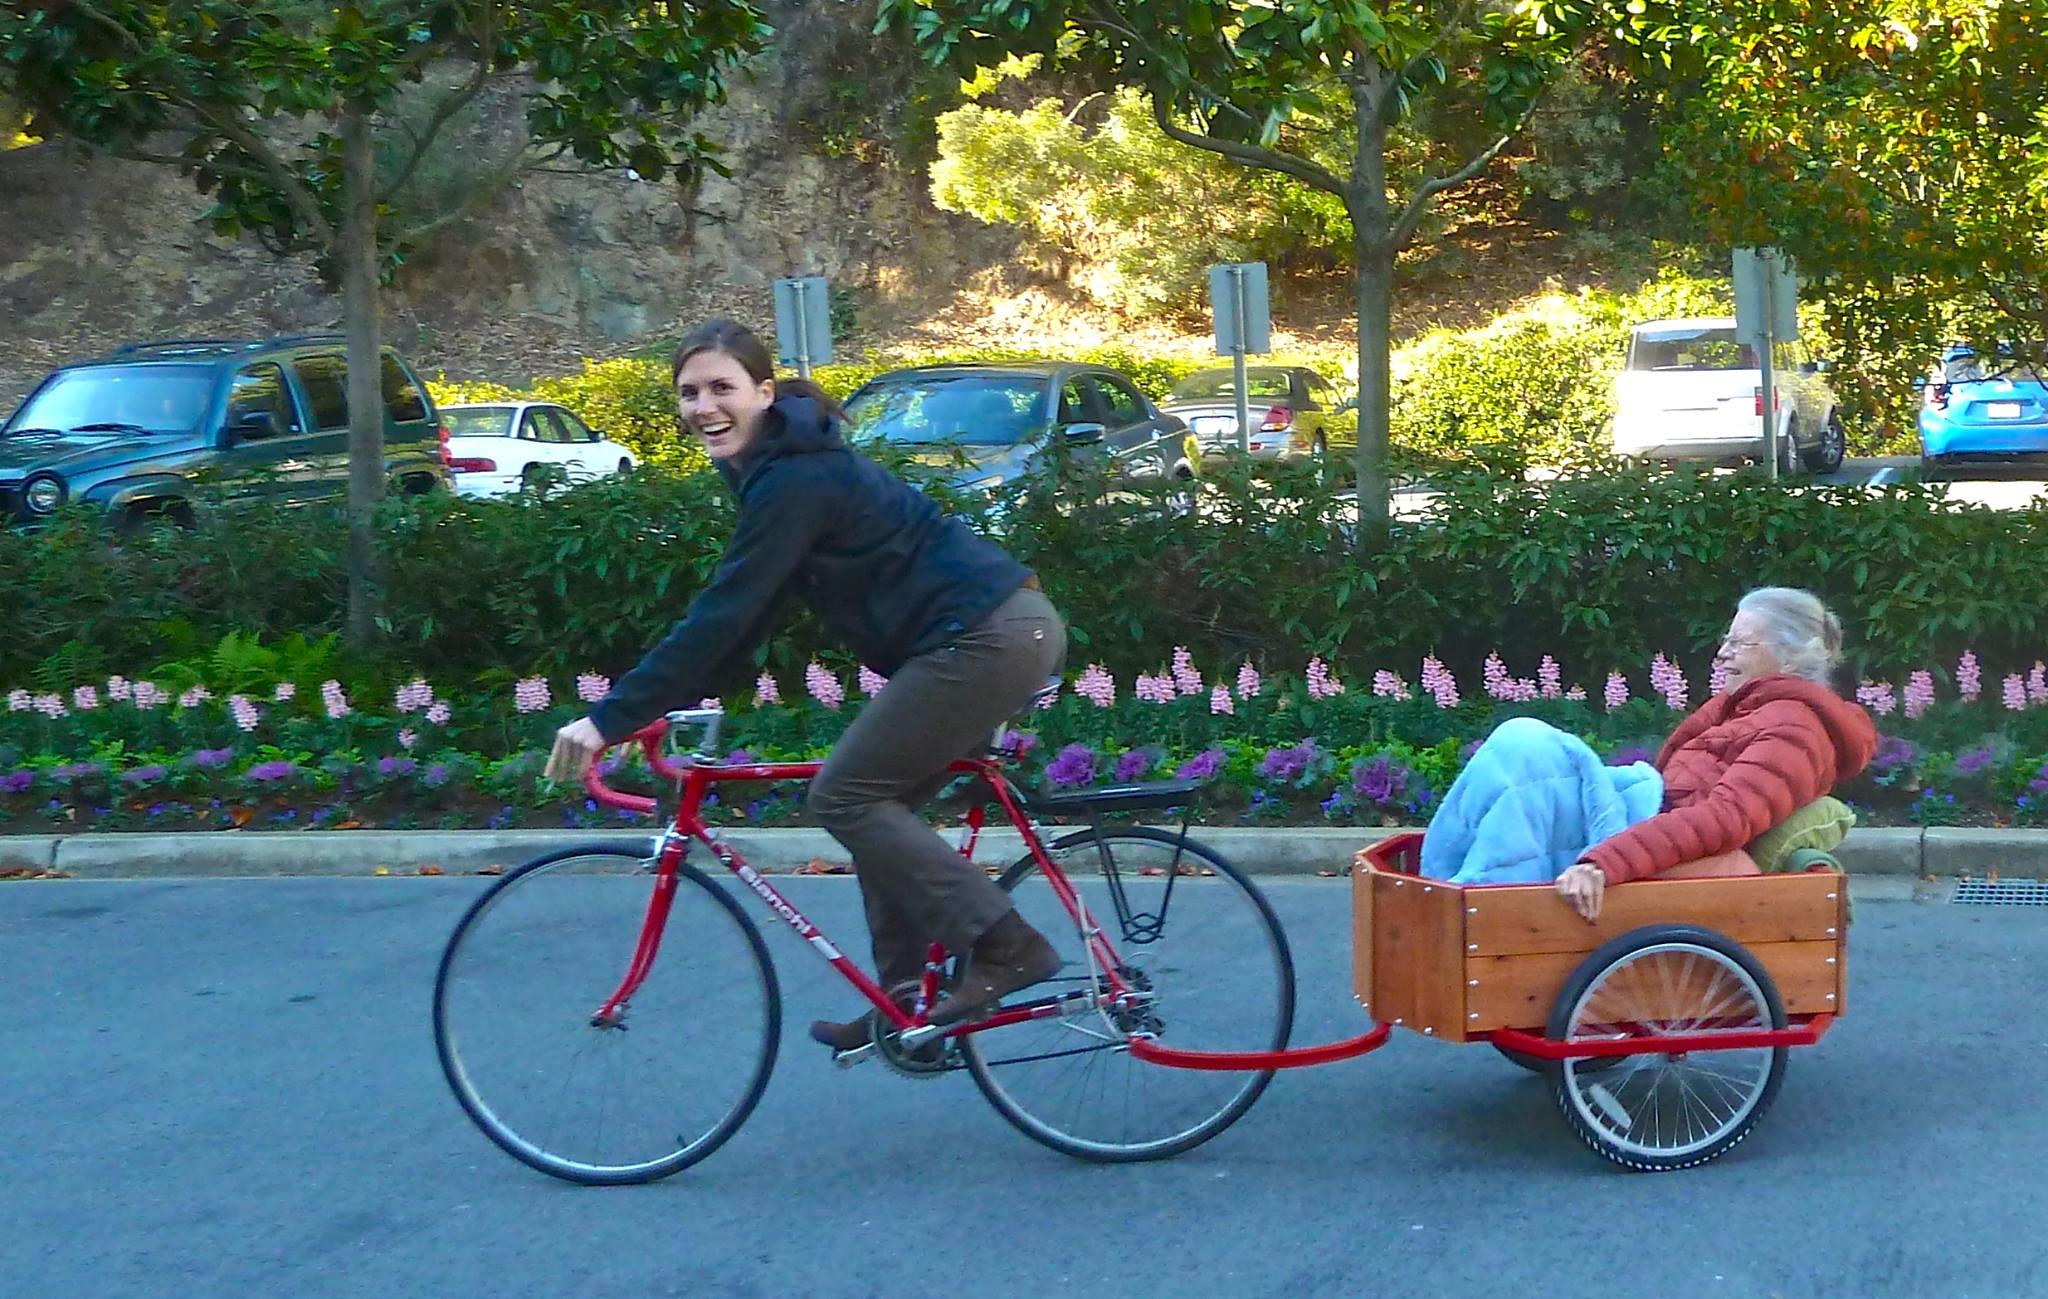 The inaugural ride of grandma in the Honeywagon